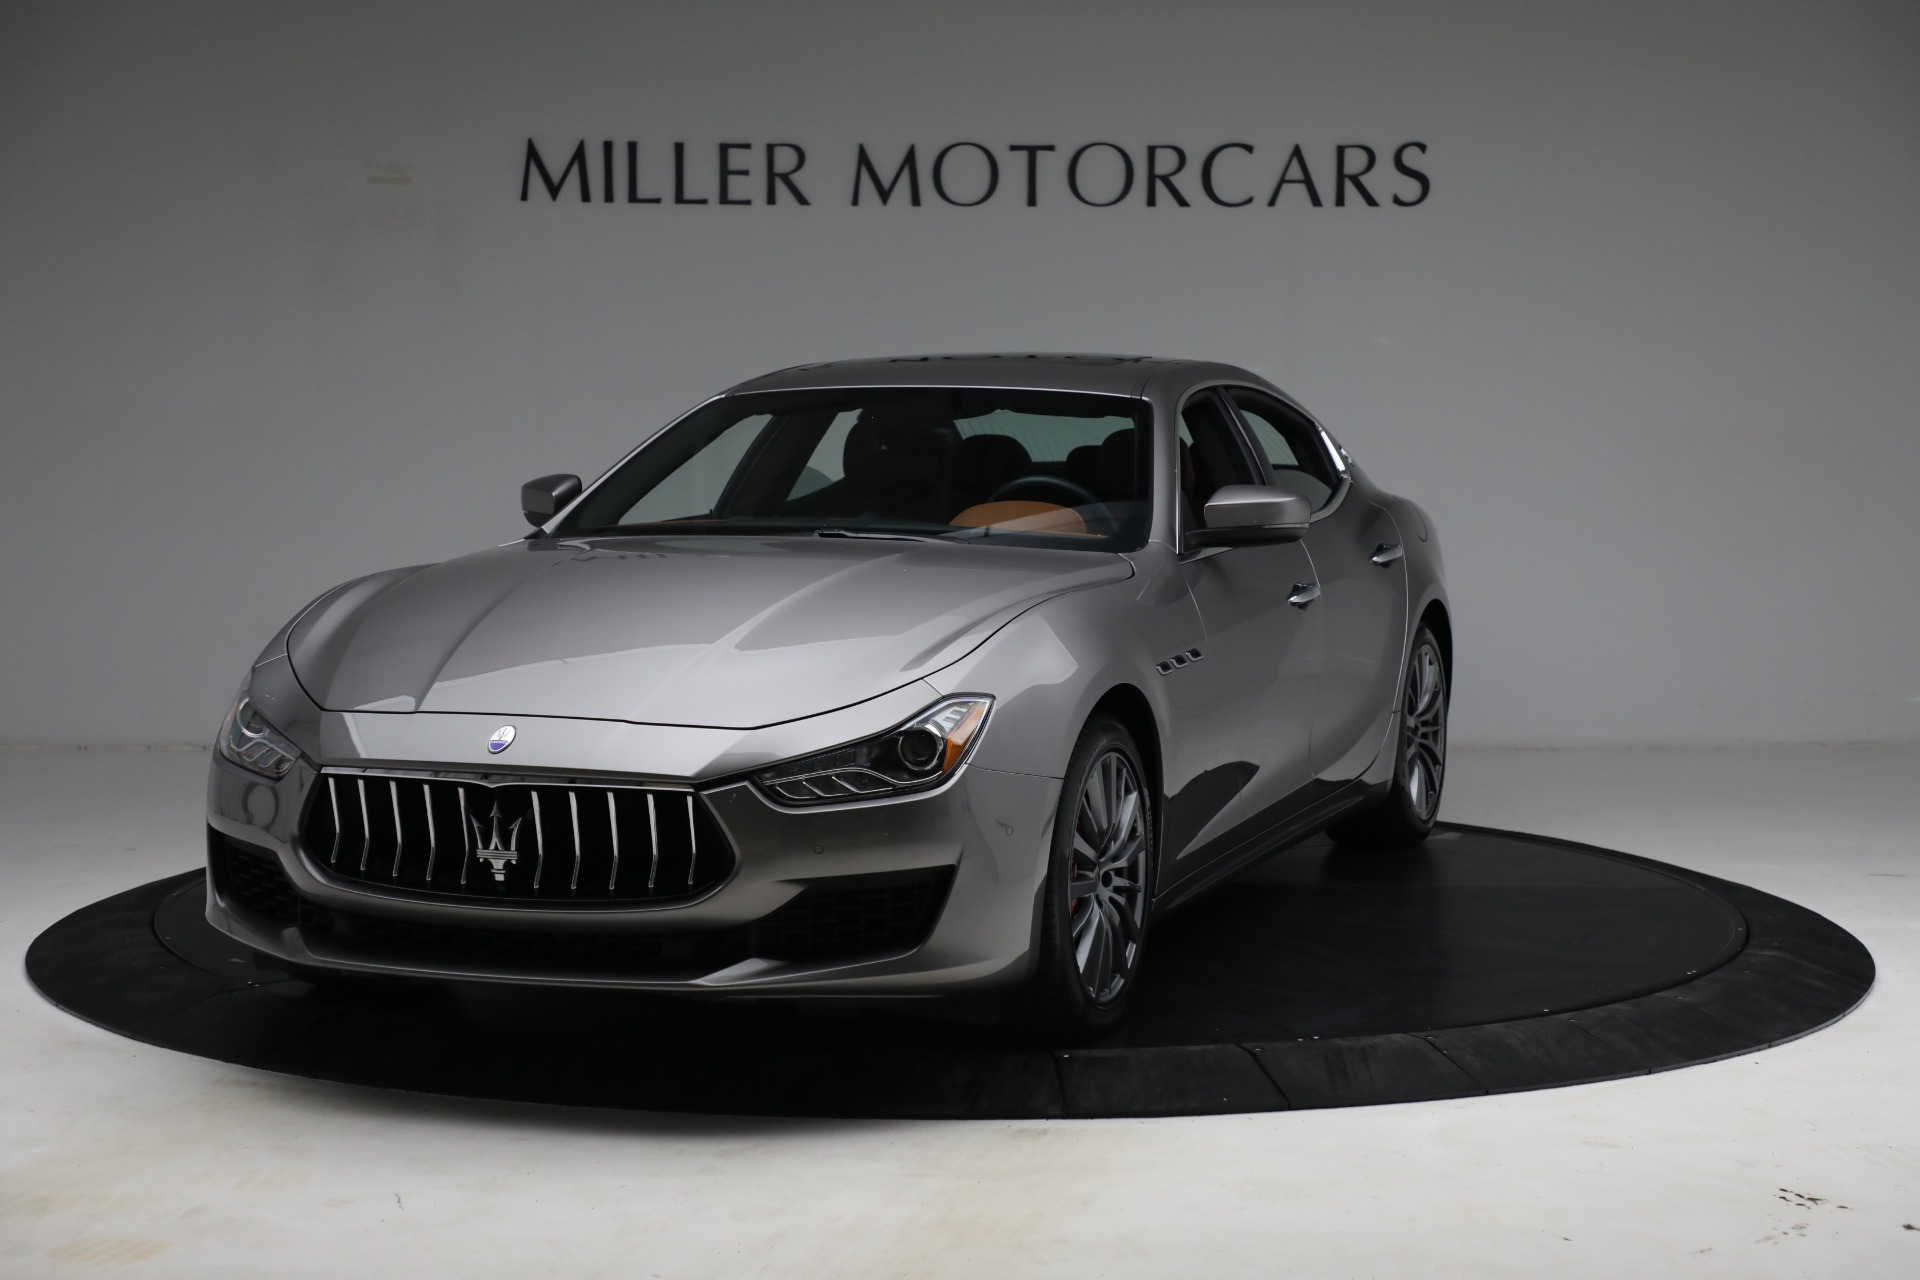 Used 2018 Maserati Ghibli S Q4 for sale $54,900 at Alfa Romeo of Greenwich in Greenwich CT 06830 1